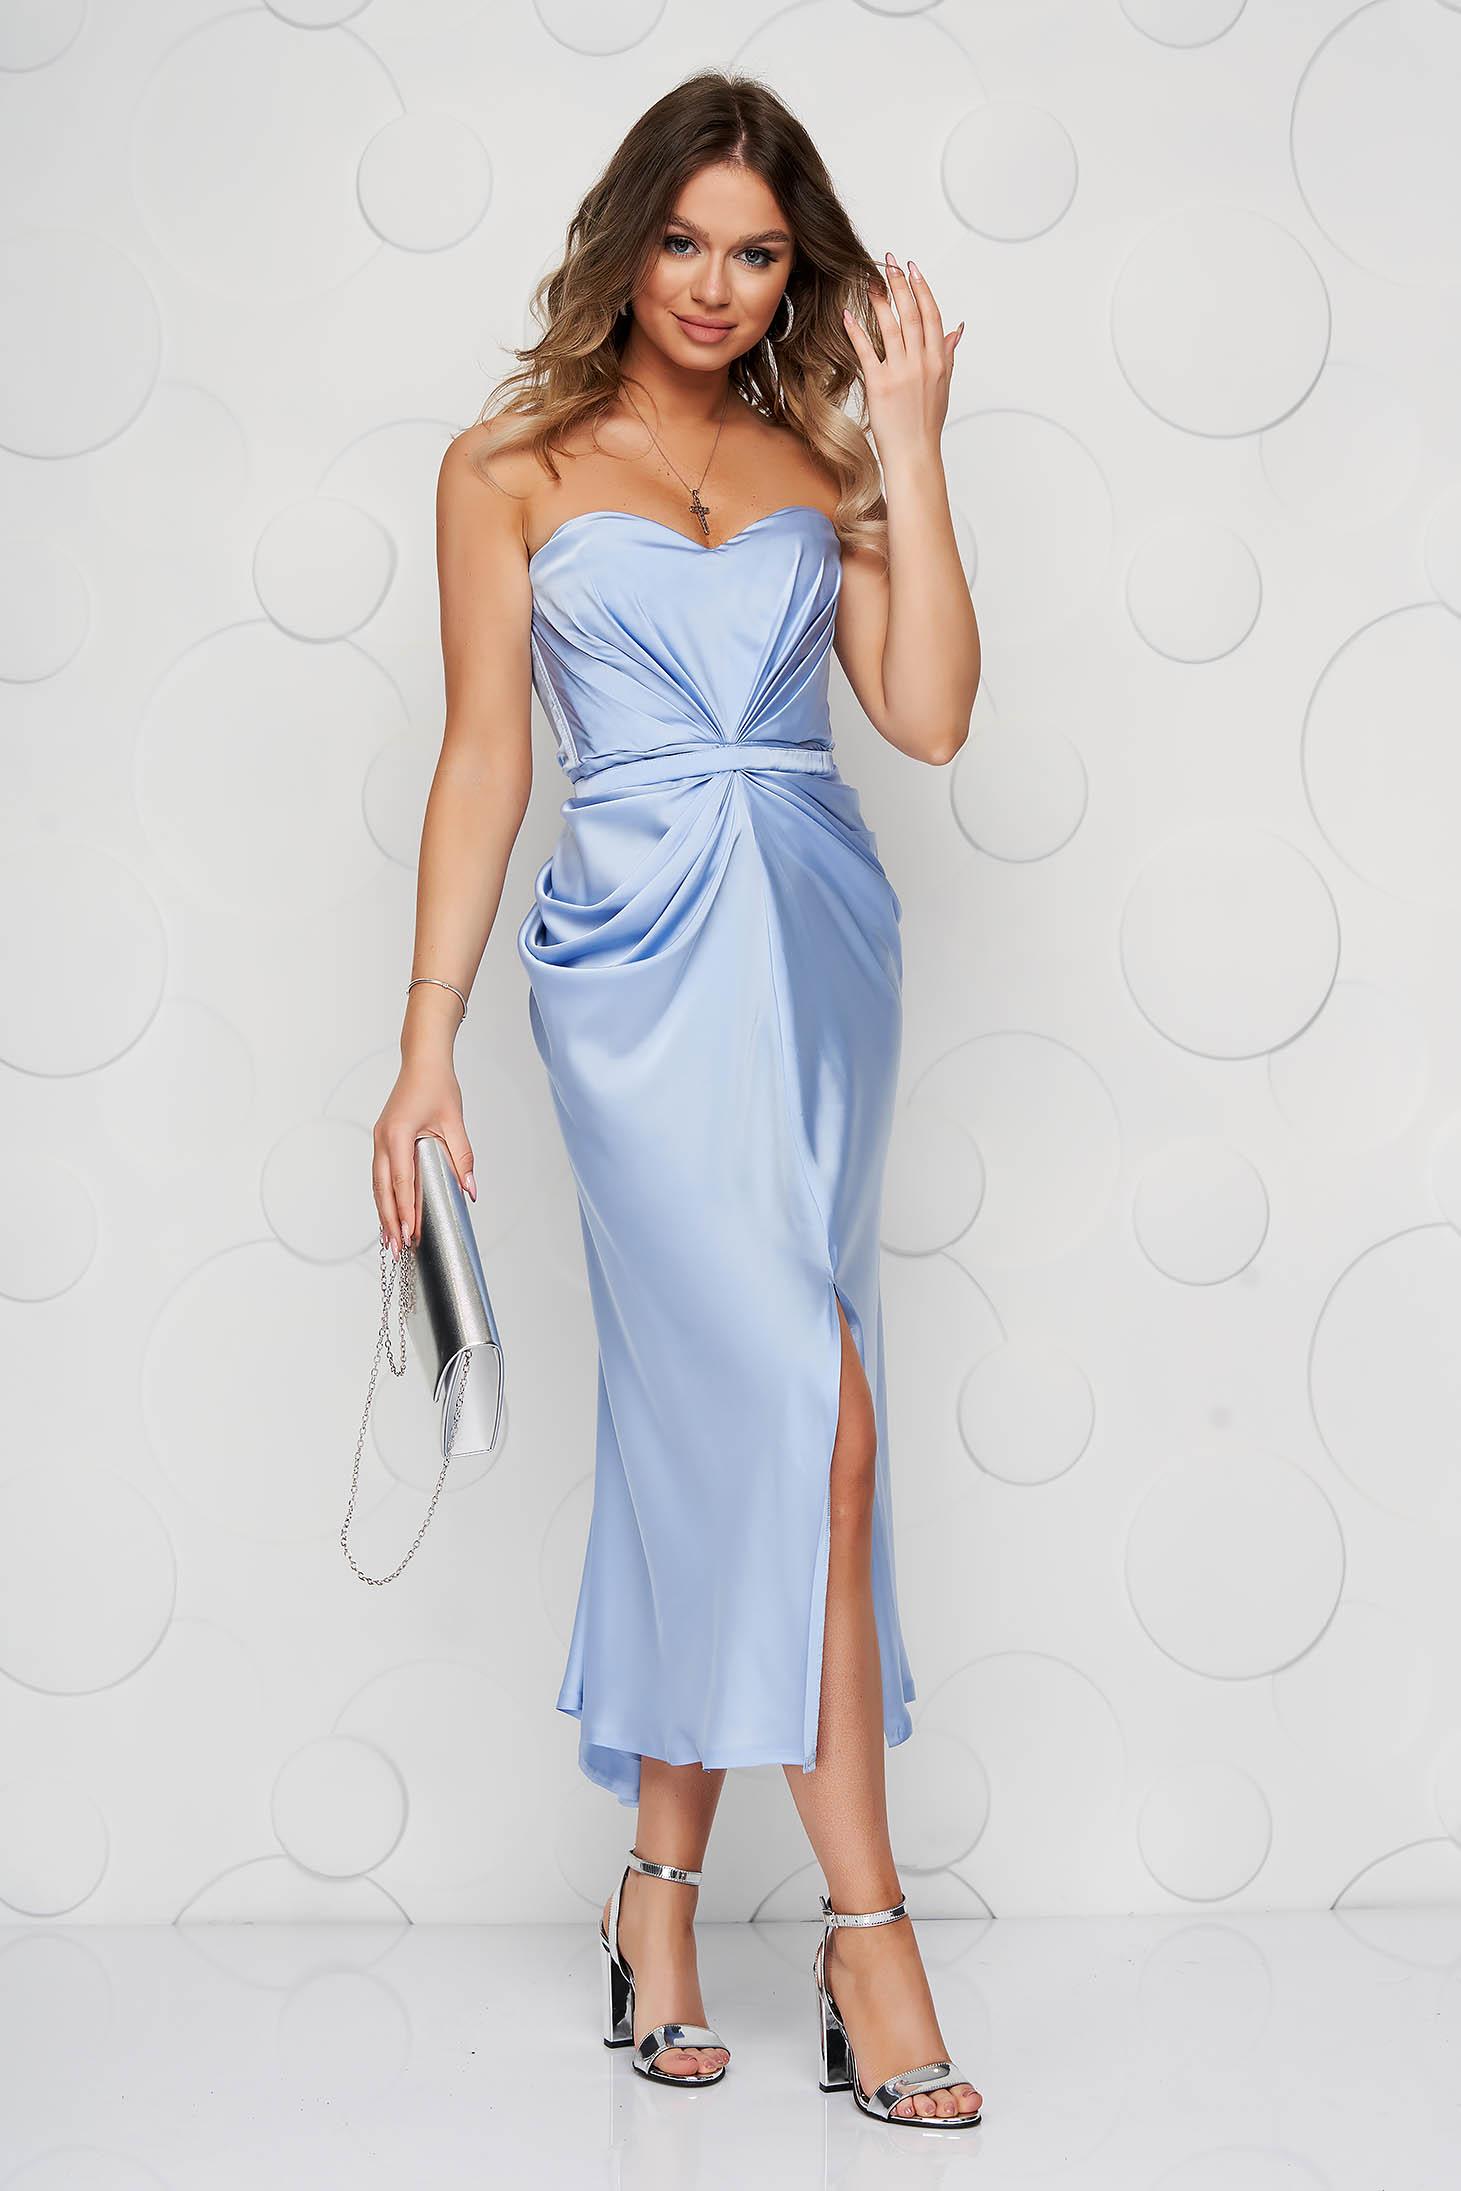 Rochie albastru-deschis de ocazie din satin in clos cu corset